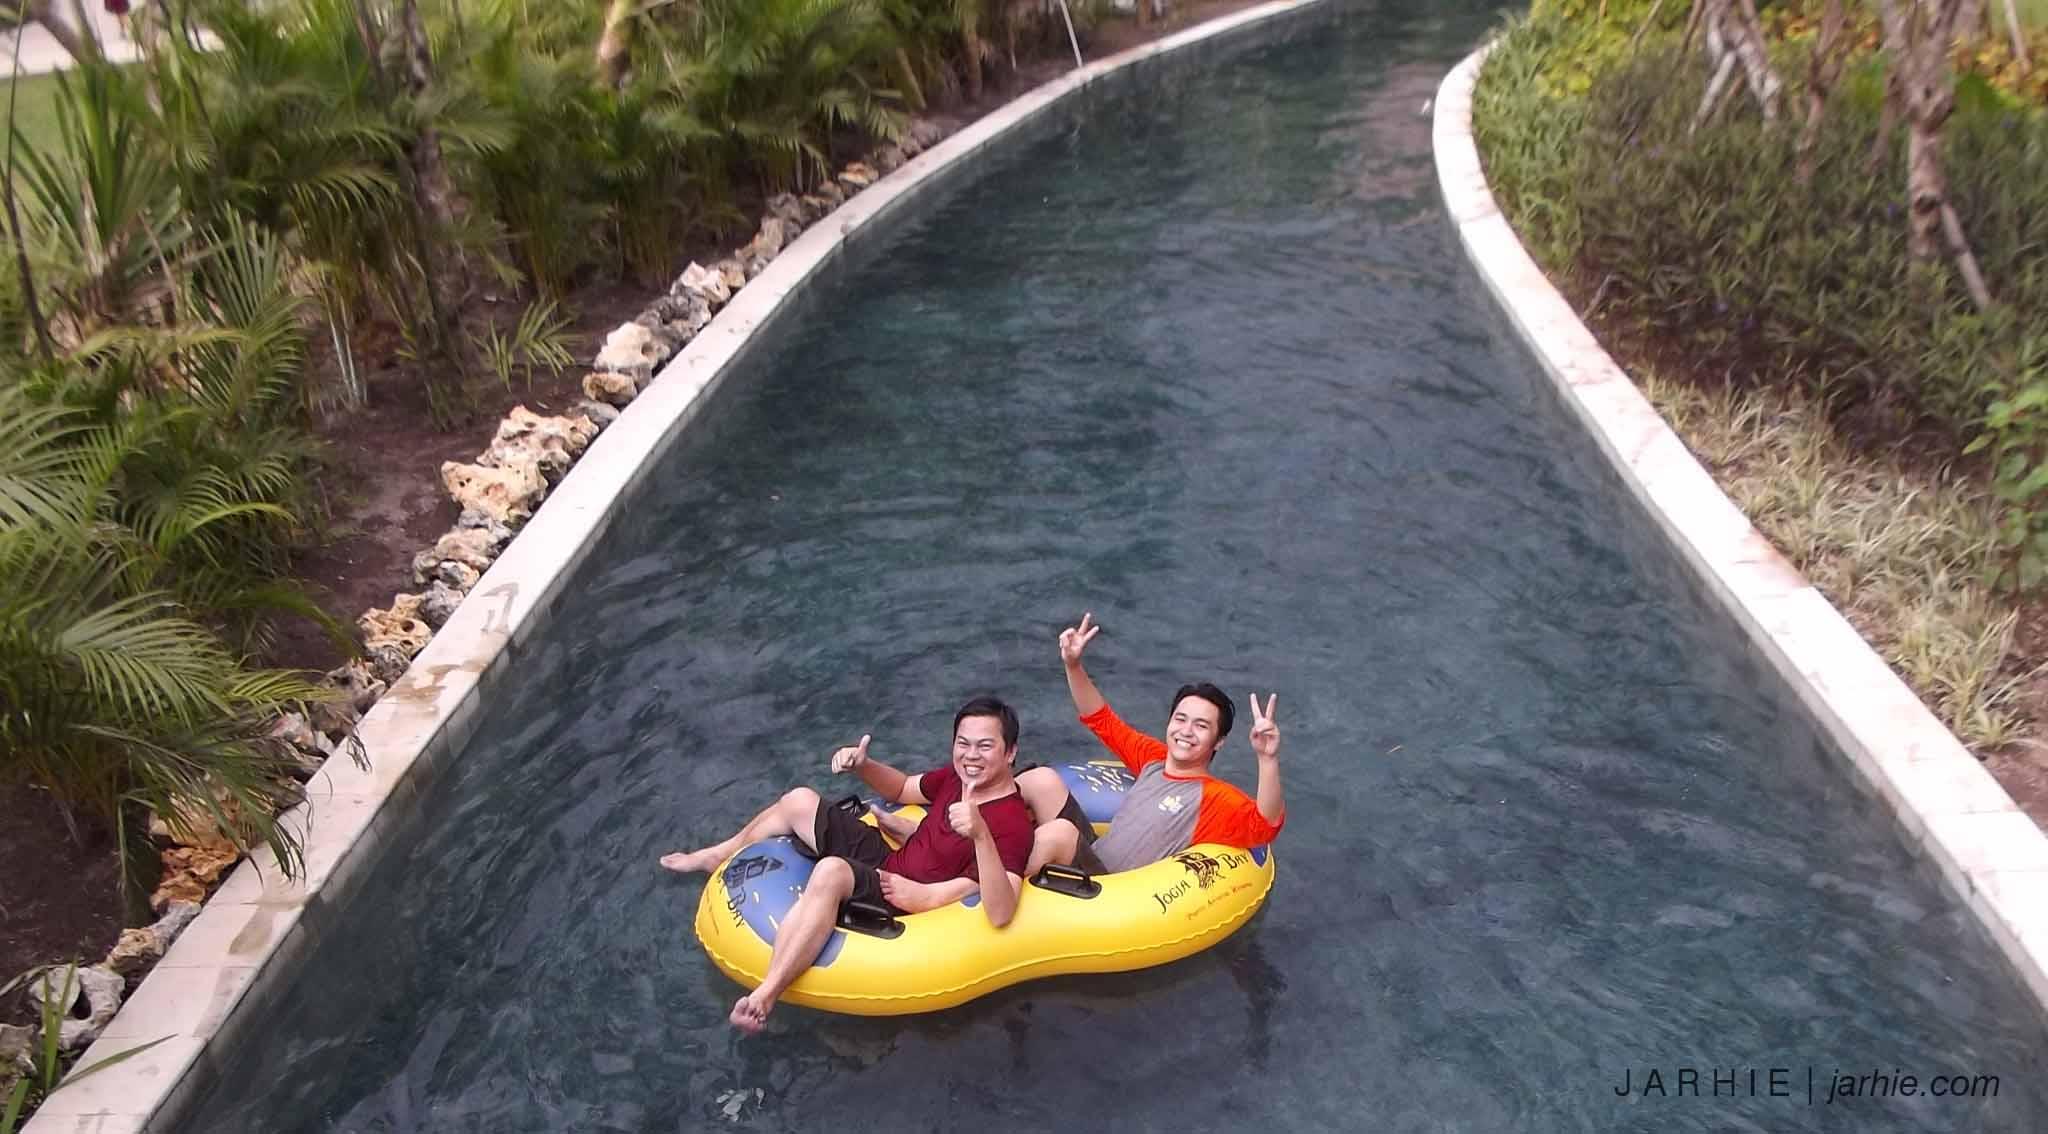 Pantai Buatan Jogja Bay Adventure Pirates Waterpark Kab Sleman